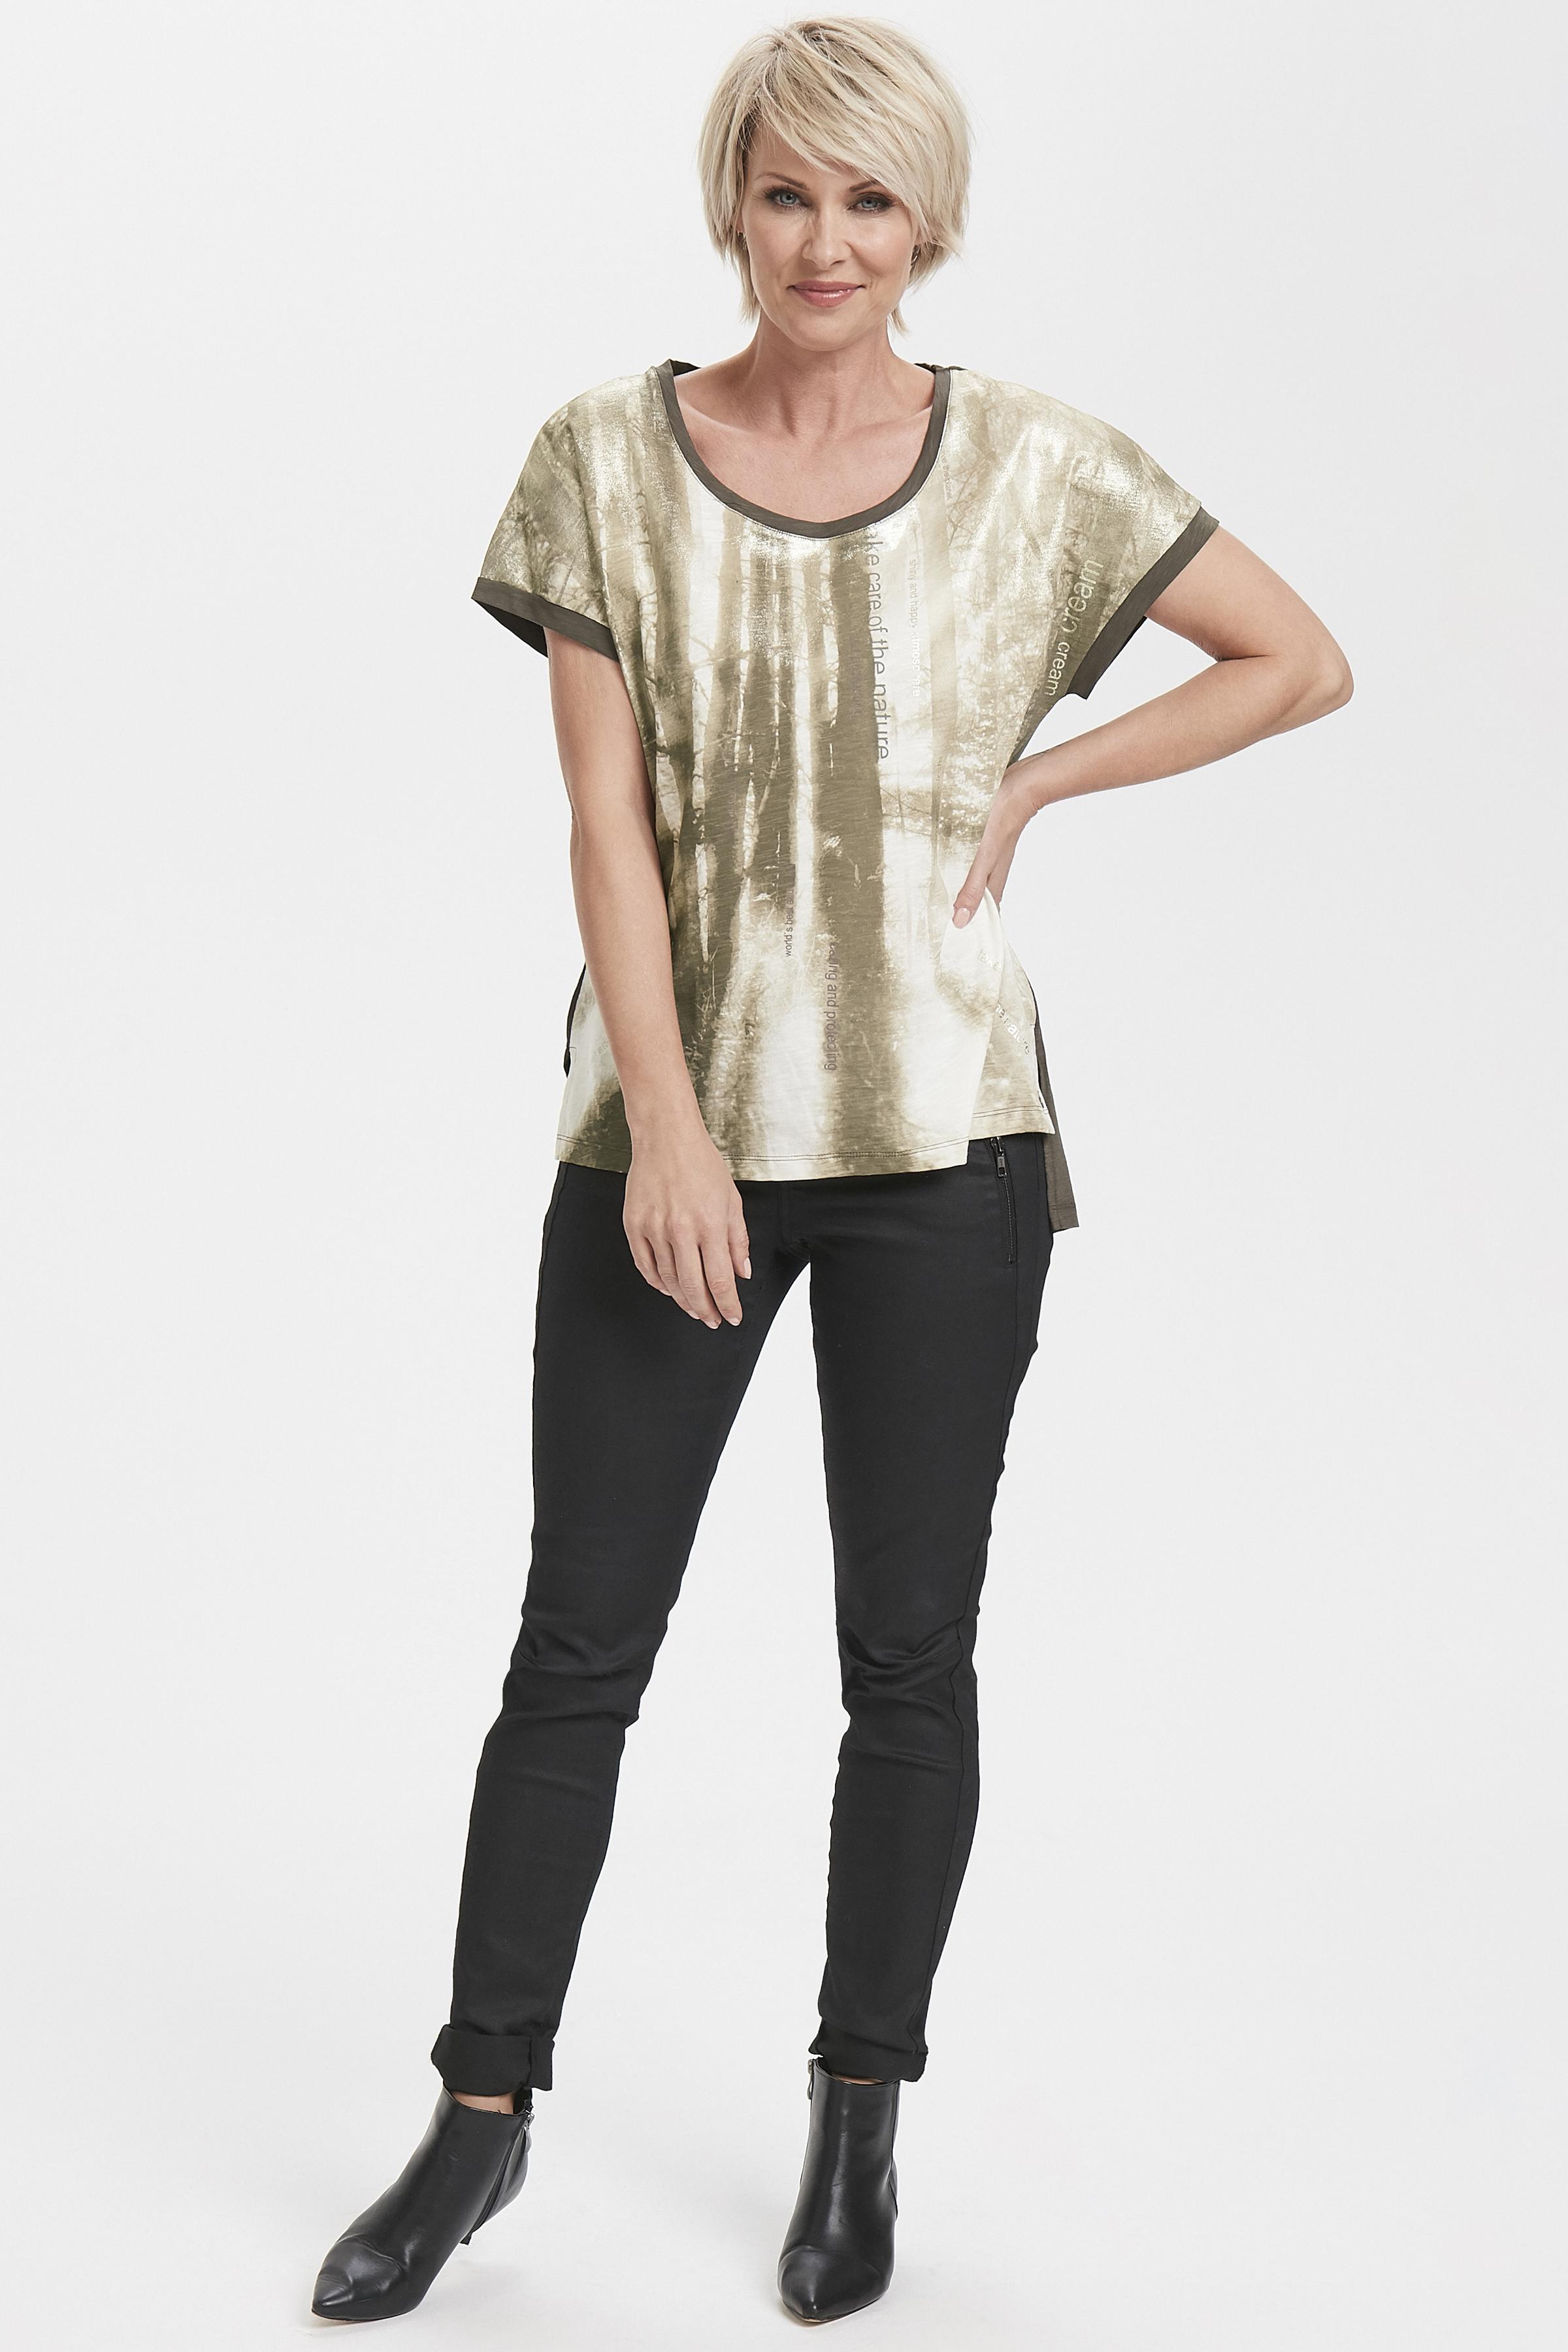 Brun/sand Kortärmad T-shirt från Cream – Köp Brun/sand Kortärmad T-shirt från stl. XS-XXL här